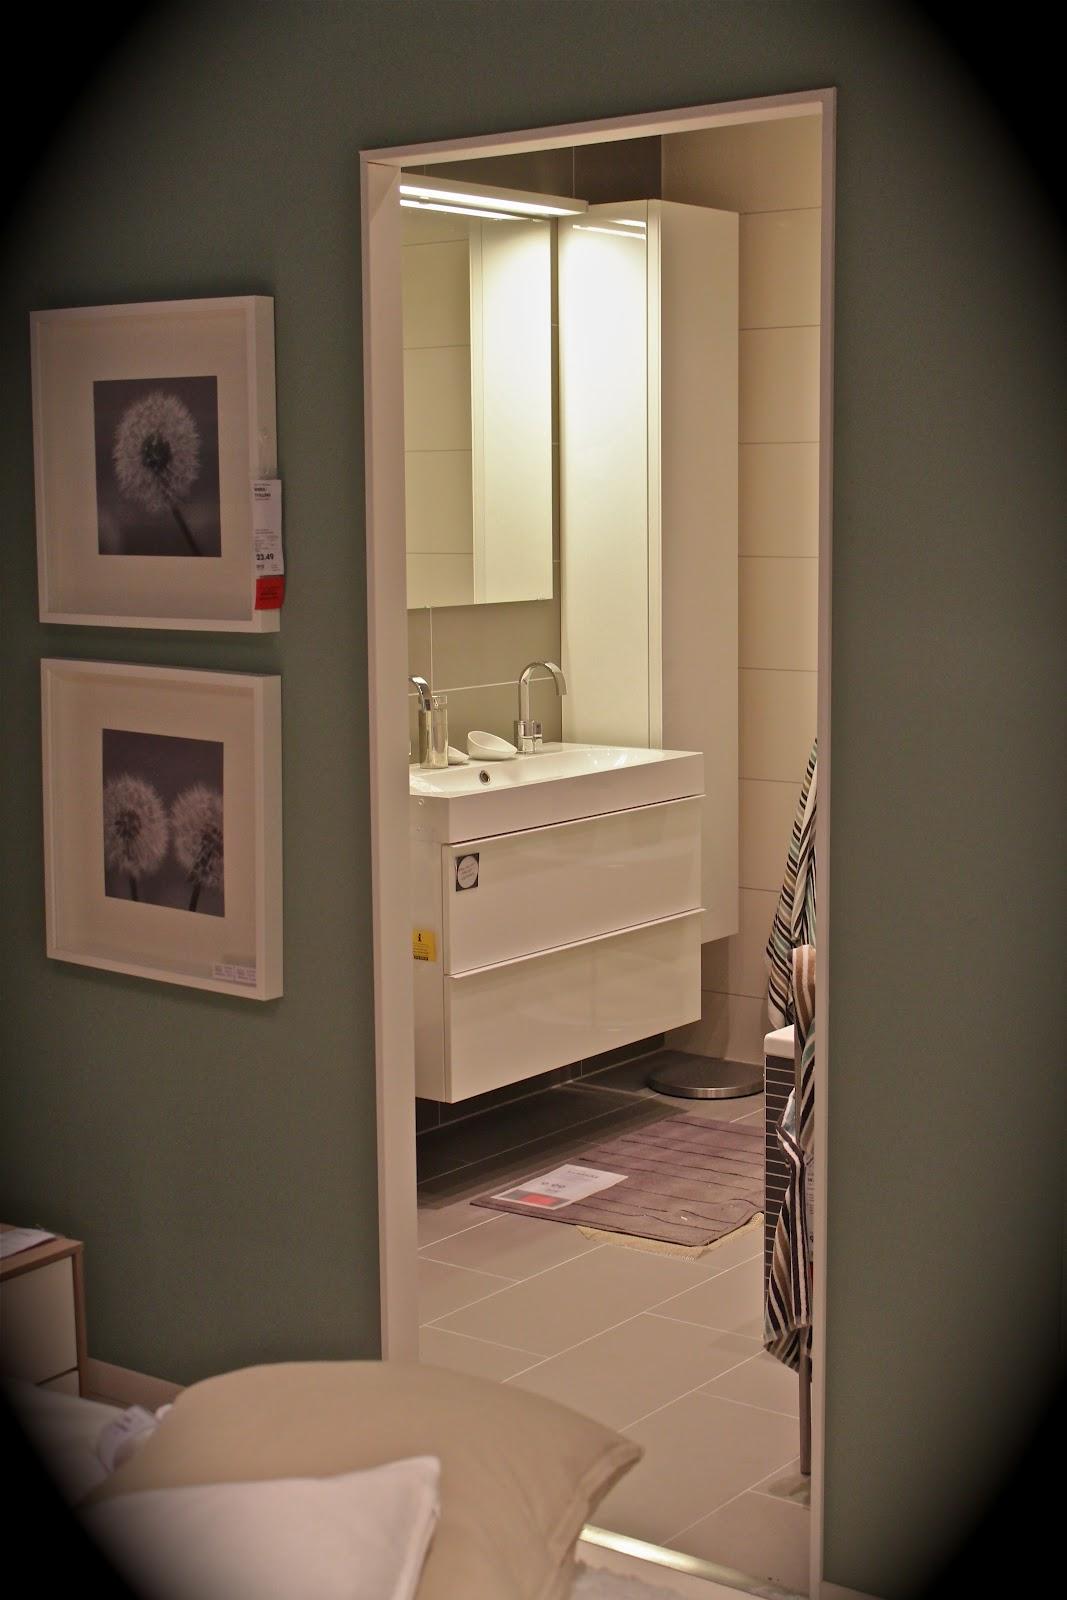 bastian der wohnprinz wohnblogger im videoformat ikea besuch haul. Black Bedroom Furniture Sets. Home Design Ideas